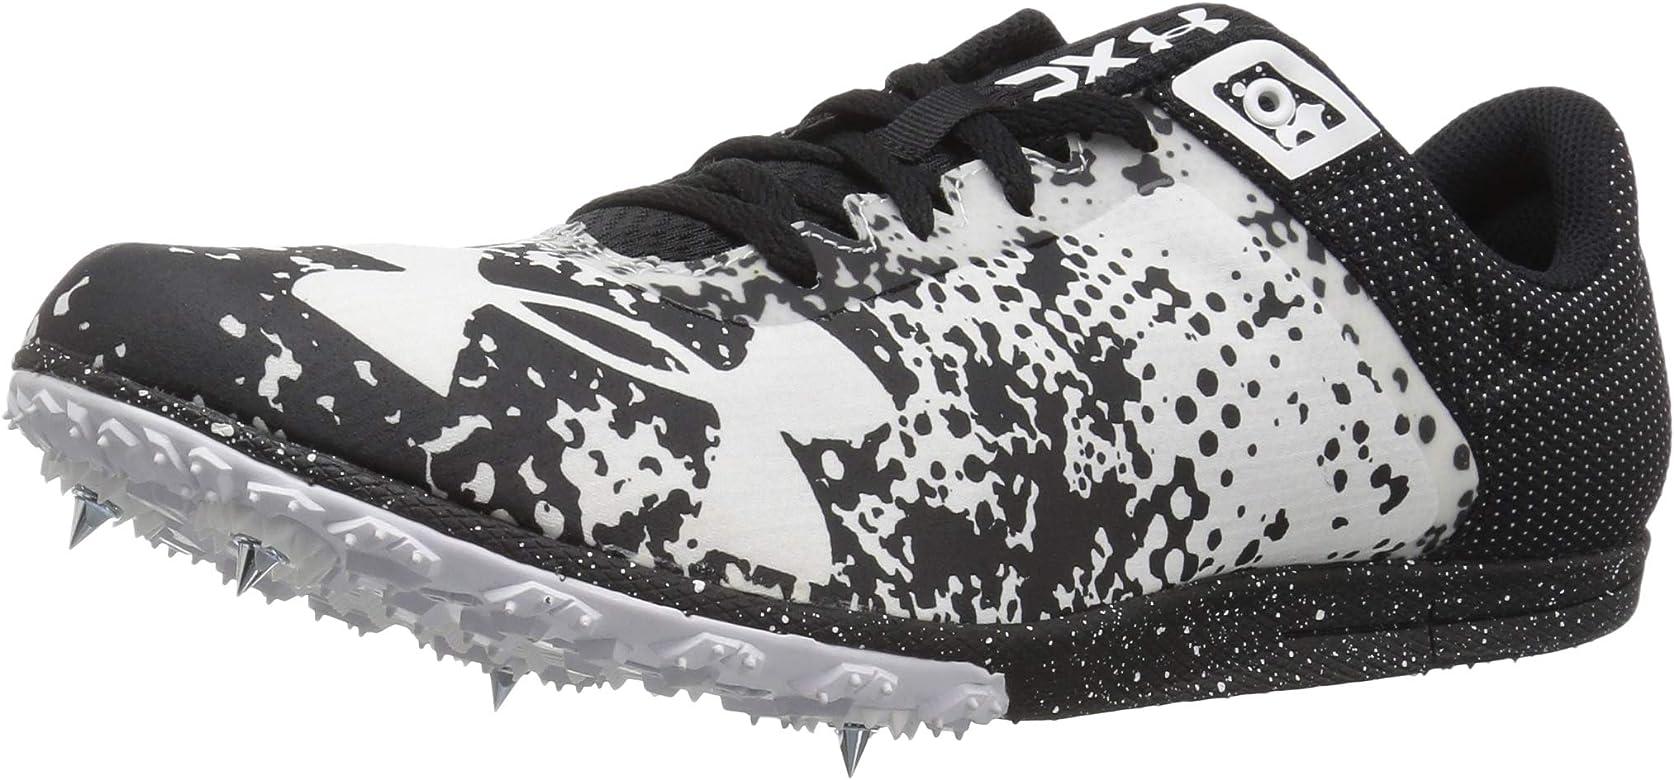 a4d683fce2 Xc Brigade Spike Athletic Shoe